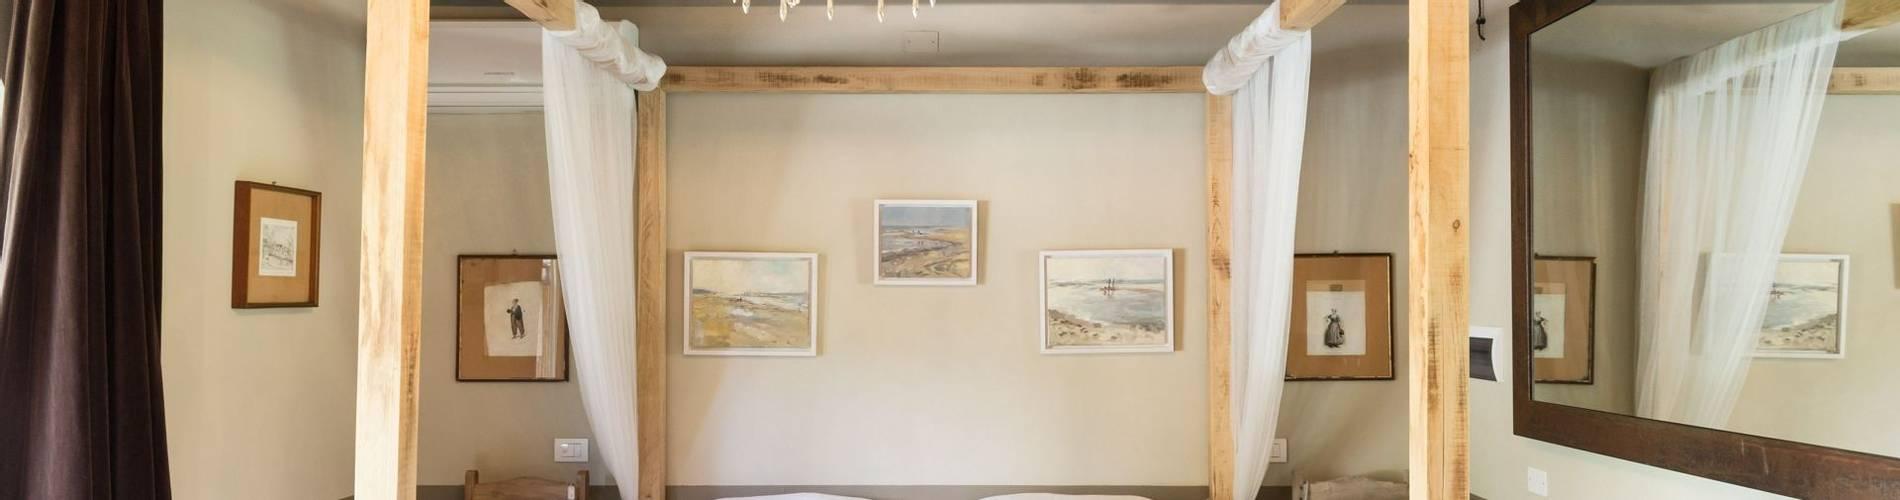 Conti Di San Bonifacio, Tuscany, Italy, Olive Grove Junior Suite (3).jpg